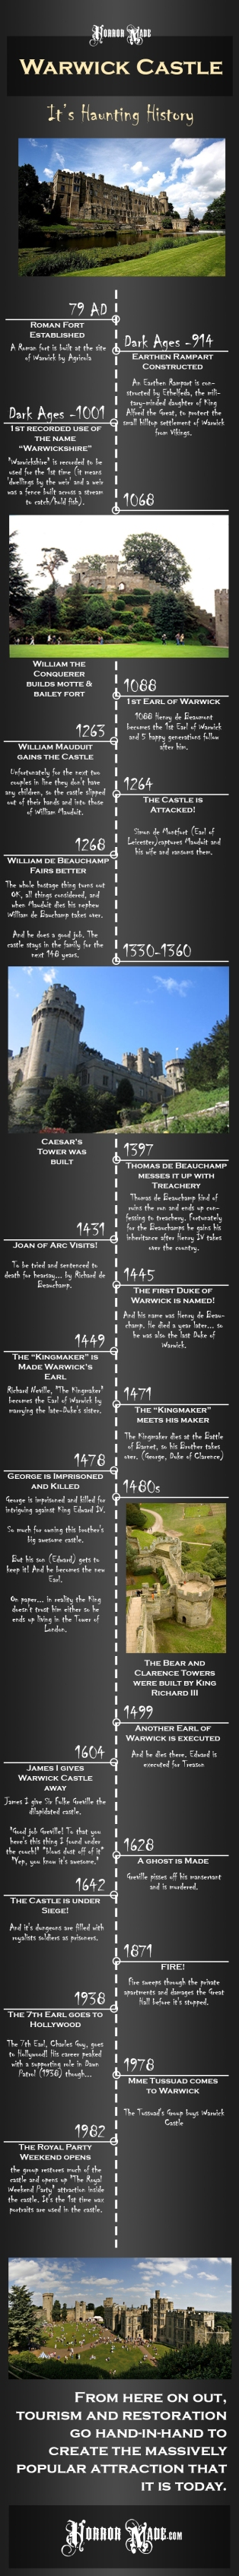 warwickinfohistory